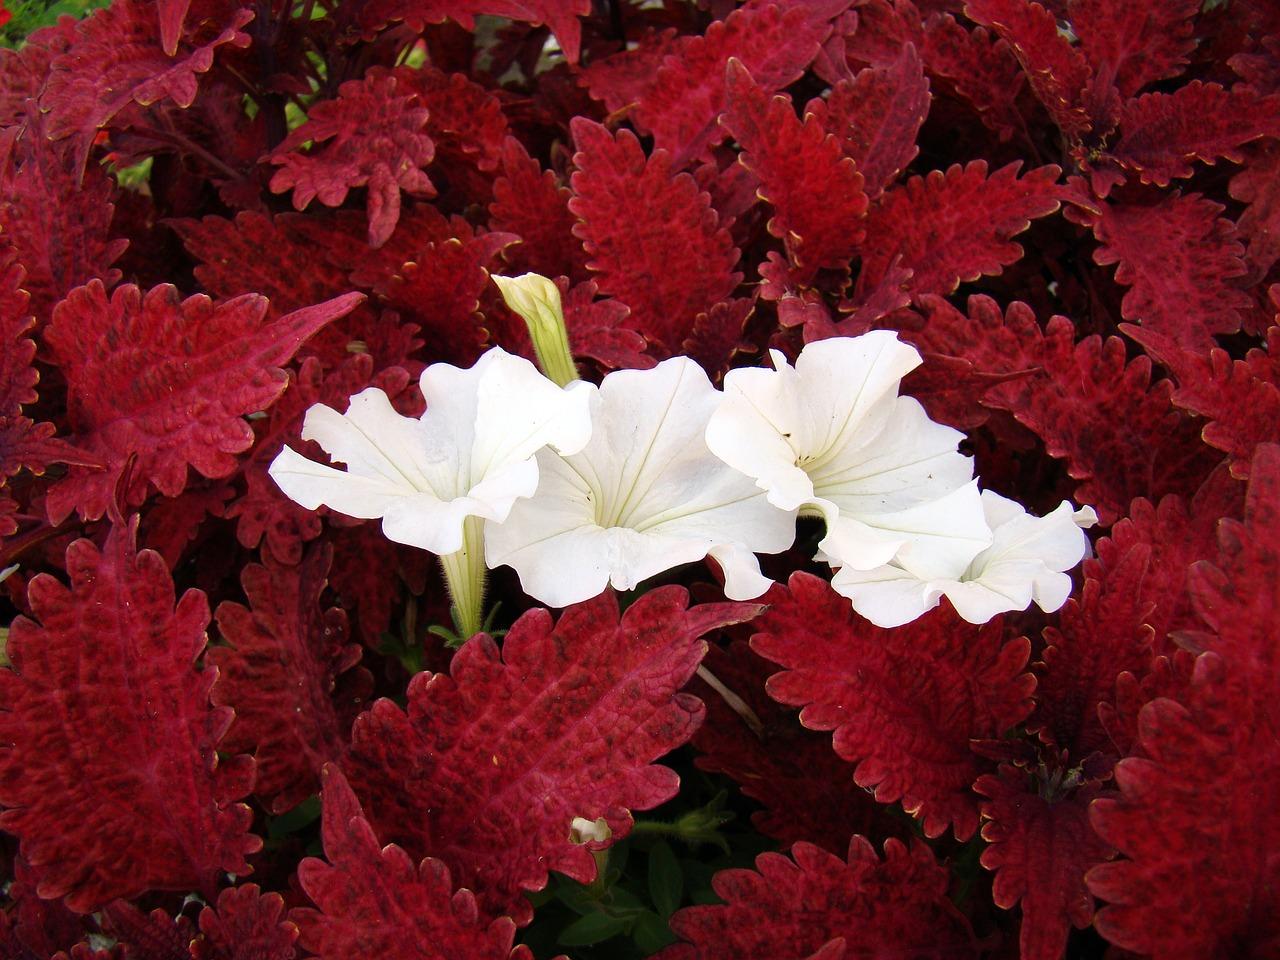 Flowerflowerswhite Flowersred Leavesfoliage Free Photo From